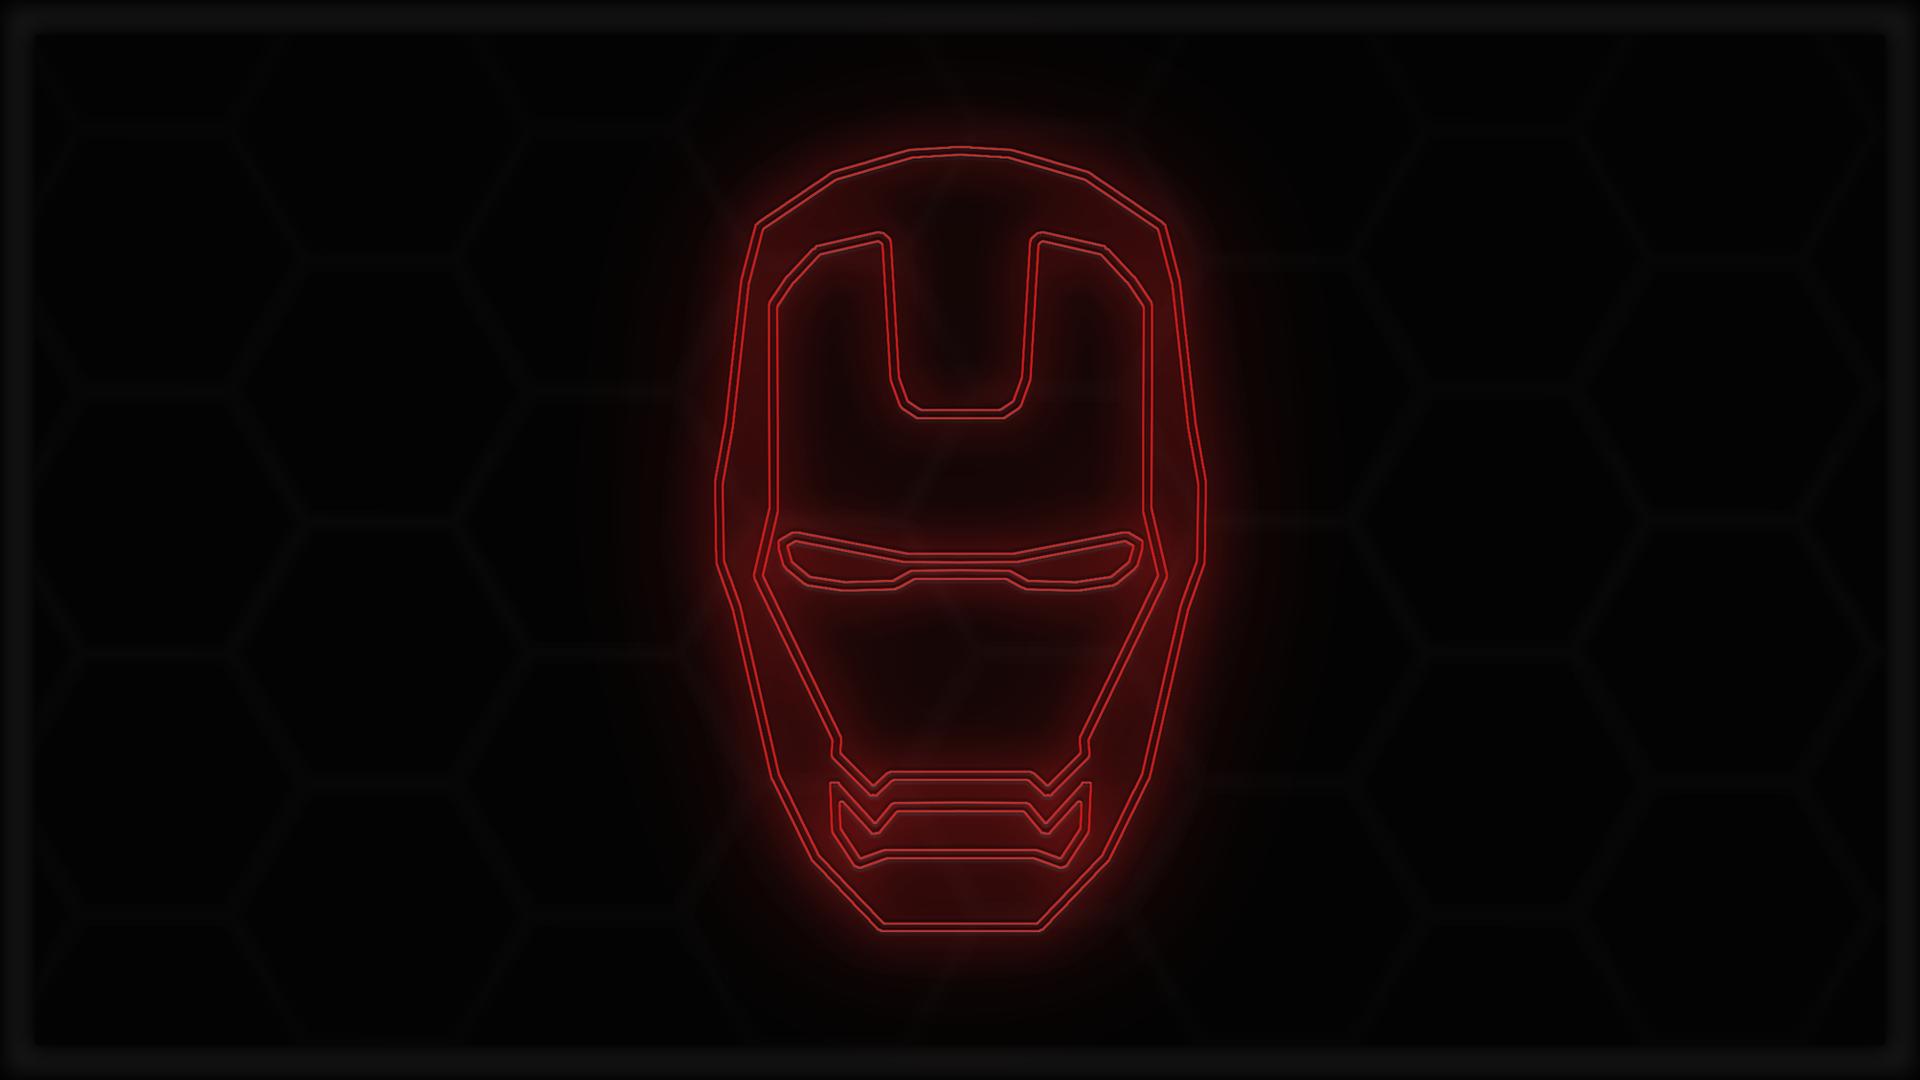 Iron Man Desktop Background X Free To Use Need Trendy Iphone Iphoneplus Case